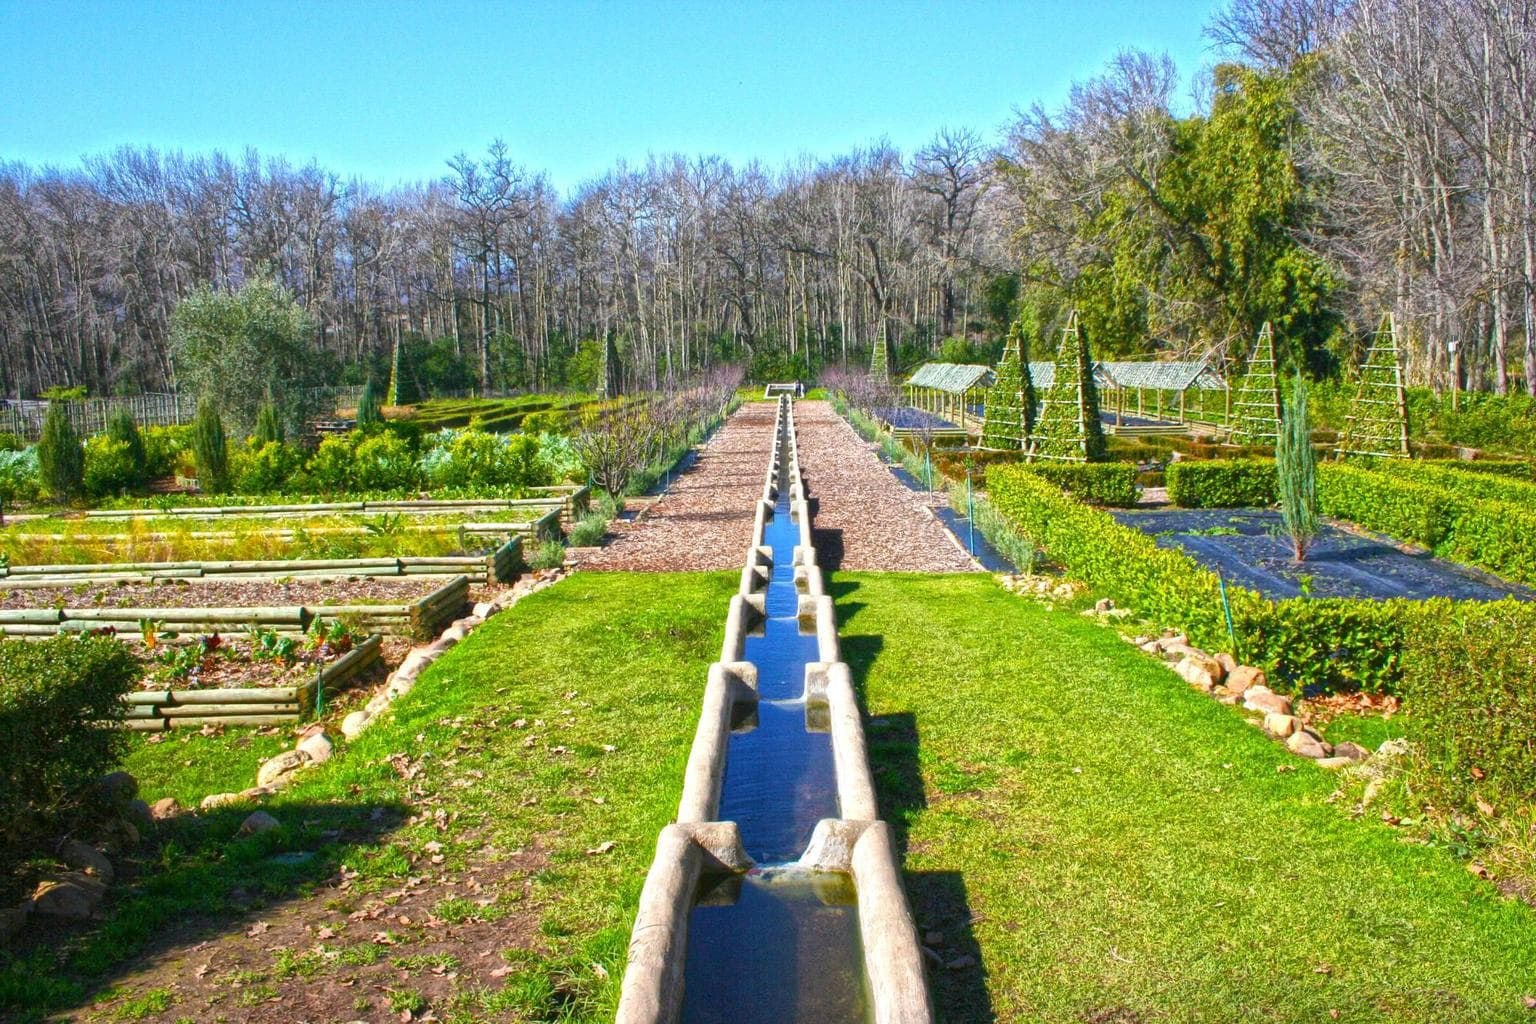 Gardening system at Boschendal